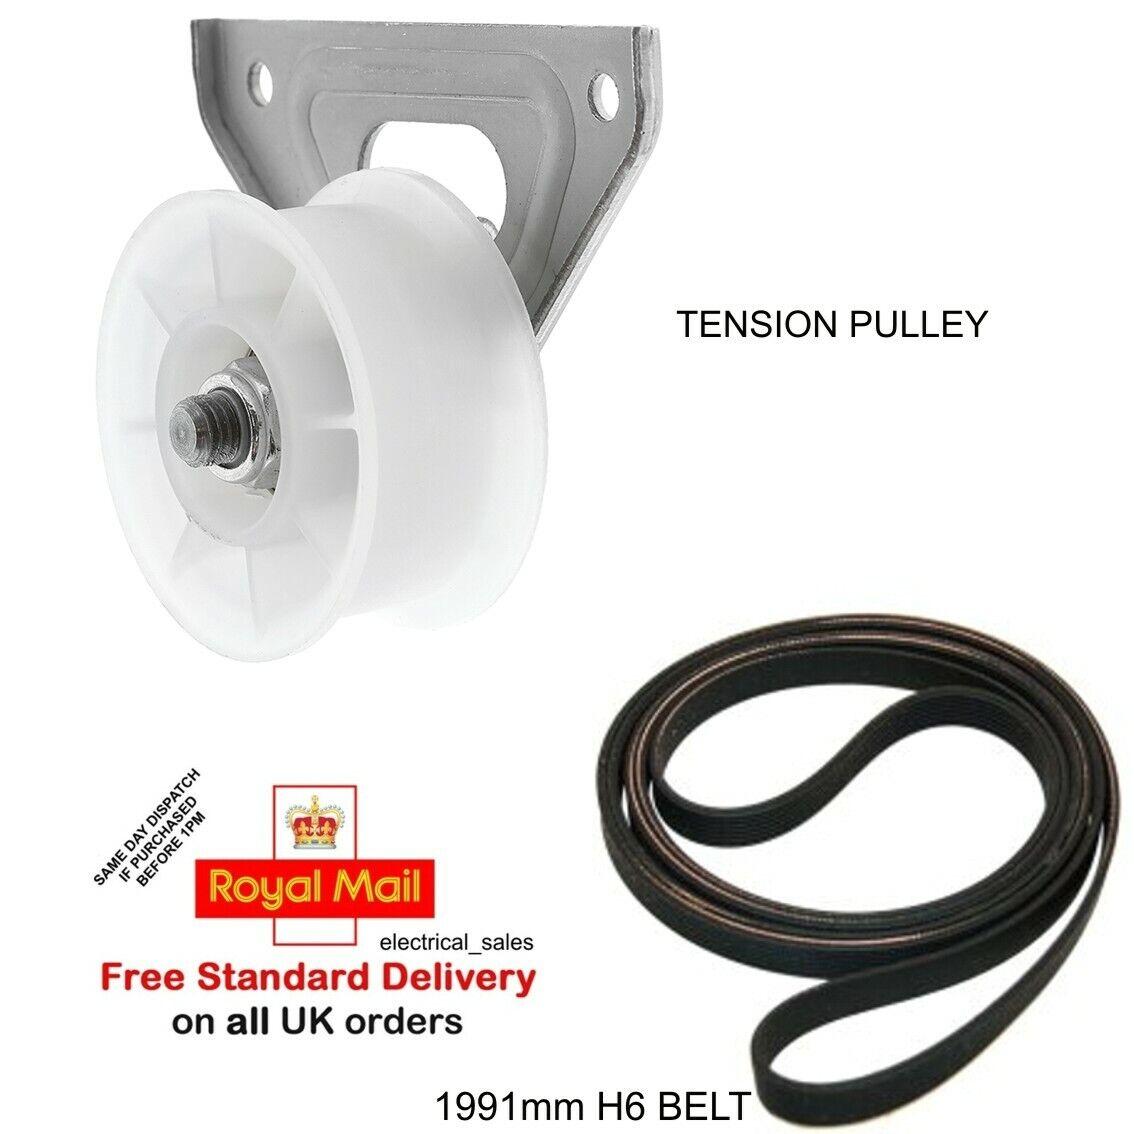 Jockey Tension Pulley Wheel for ARISTON Tumble Dryer 1991 H6 Drive Belt